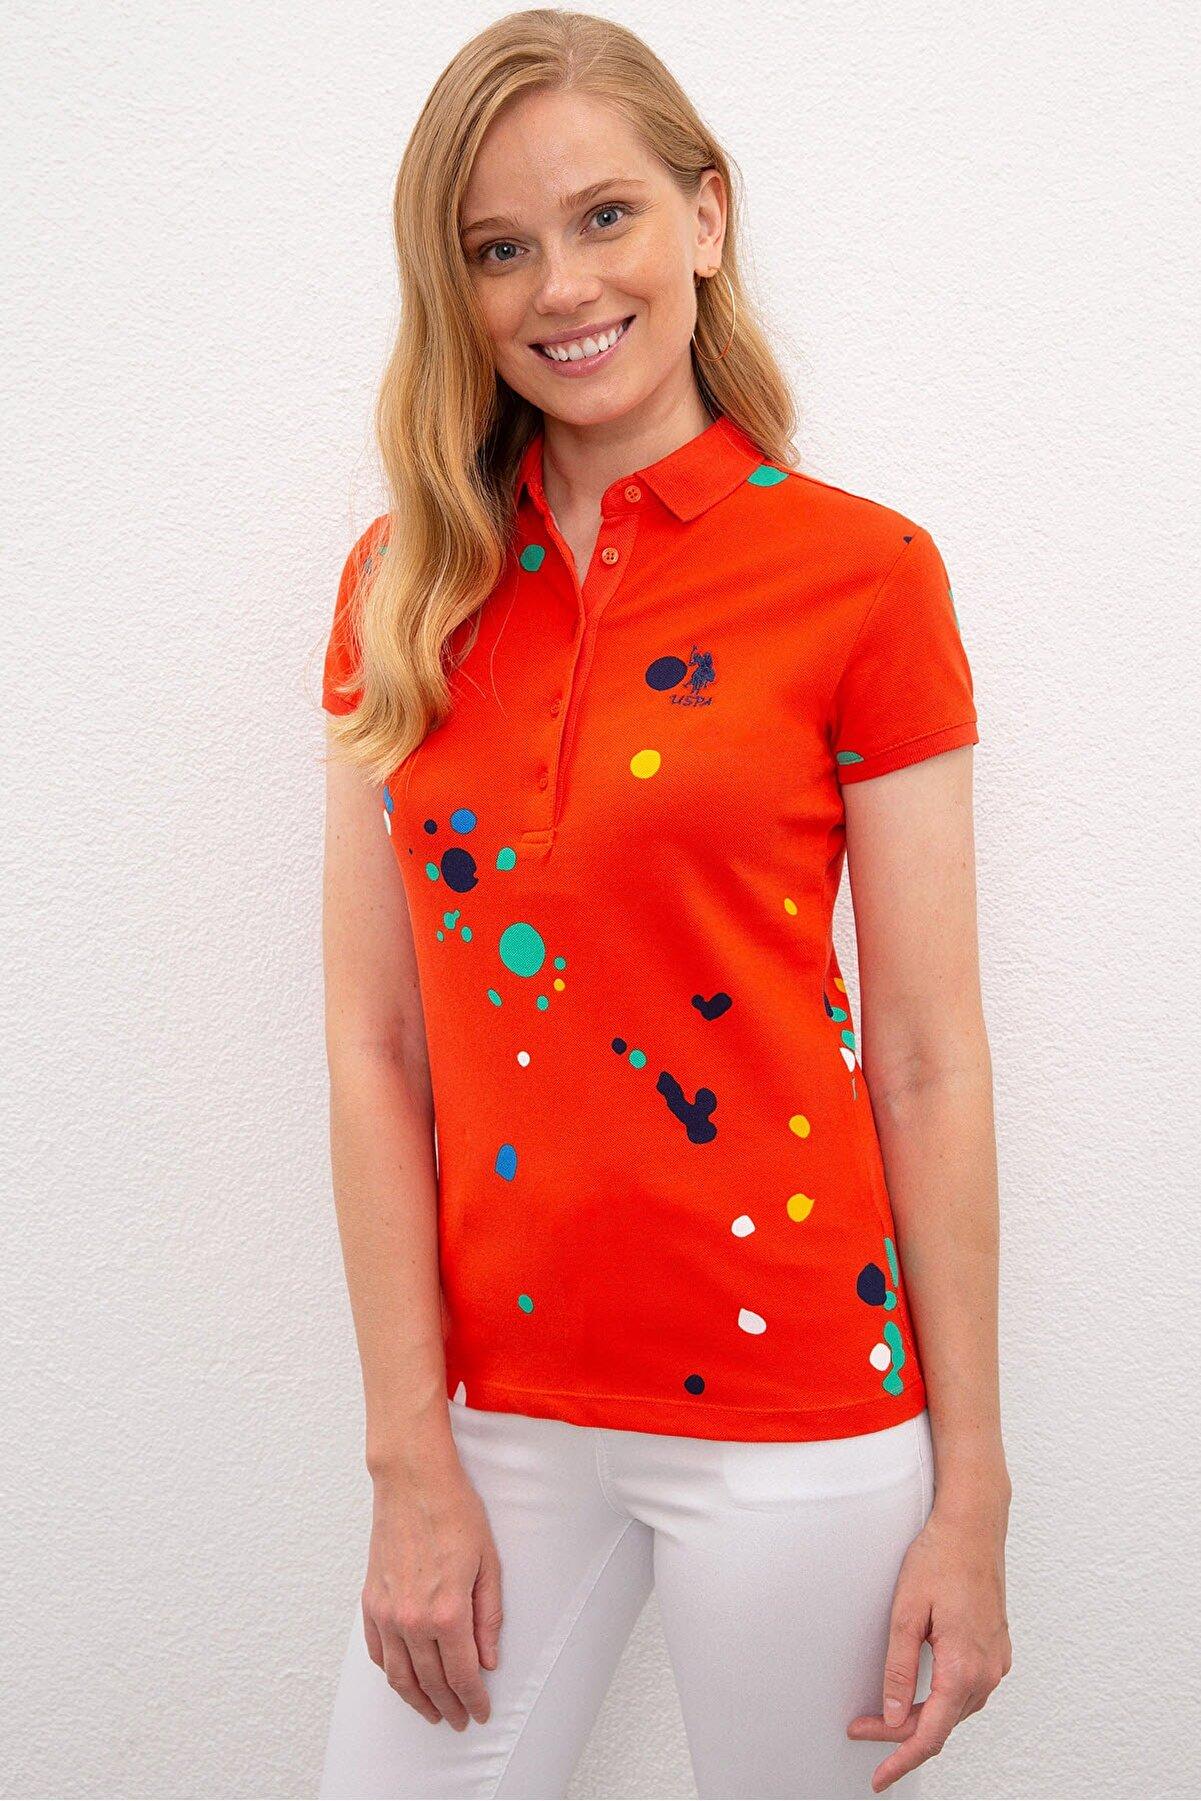 US Polo Assn Kadın T-Shirt G082GL011.000.937685